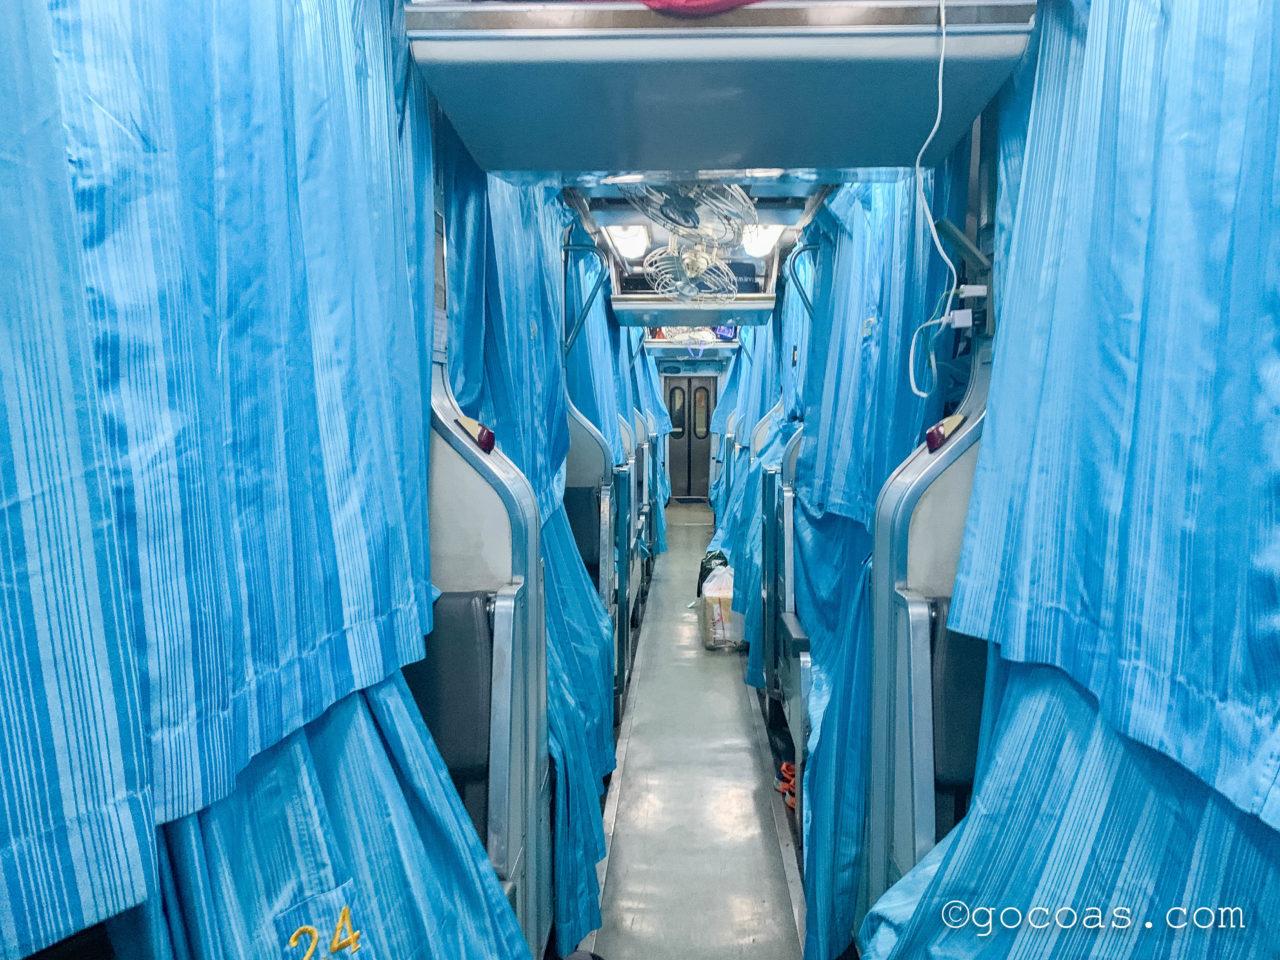 Hua Lamphong駅で乗った電車内の座席をベッド変えた車内